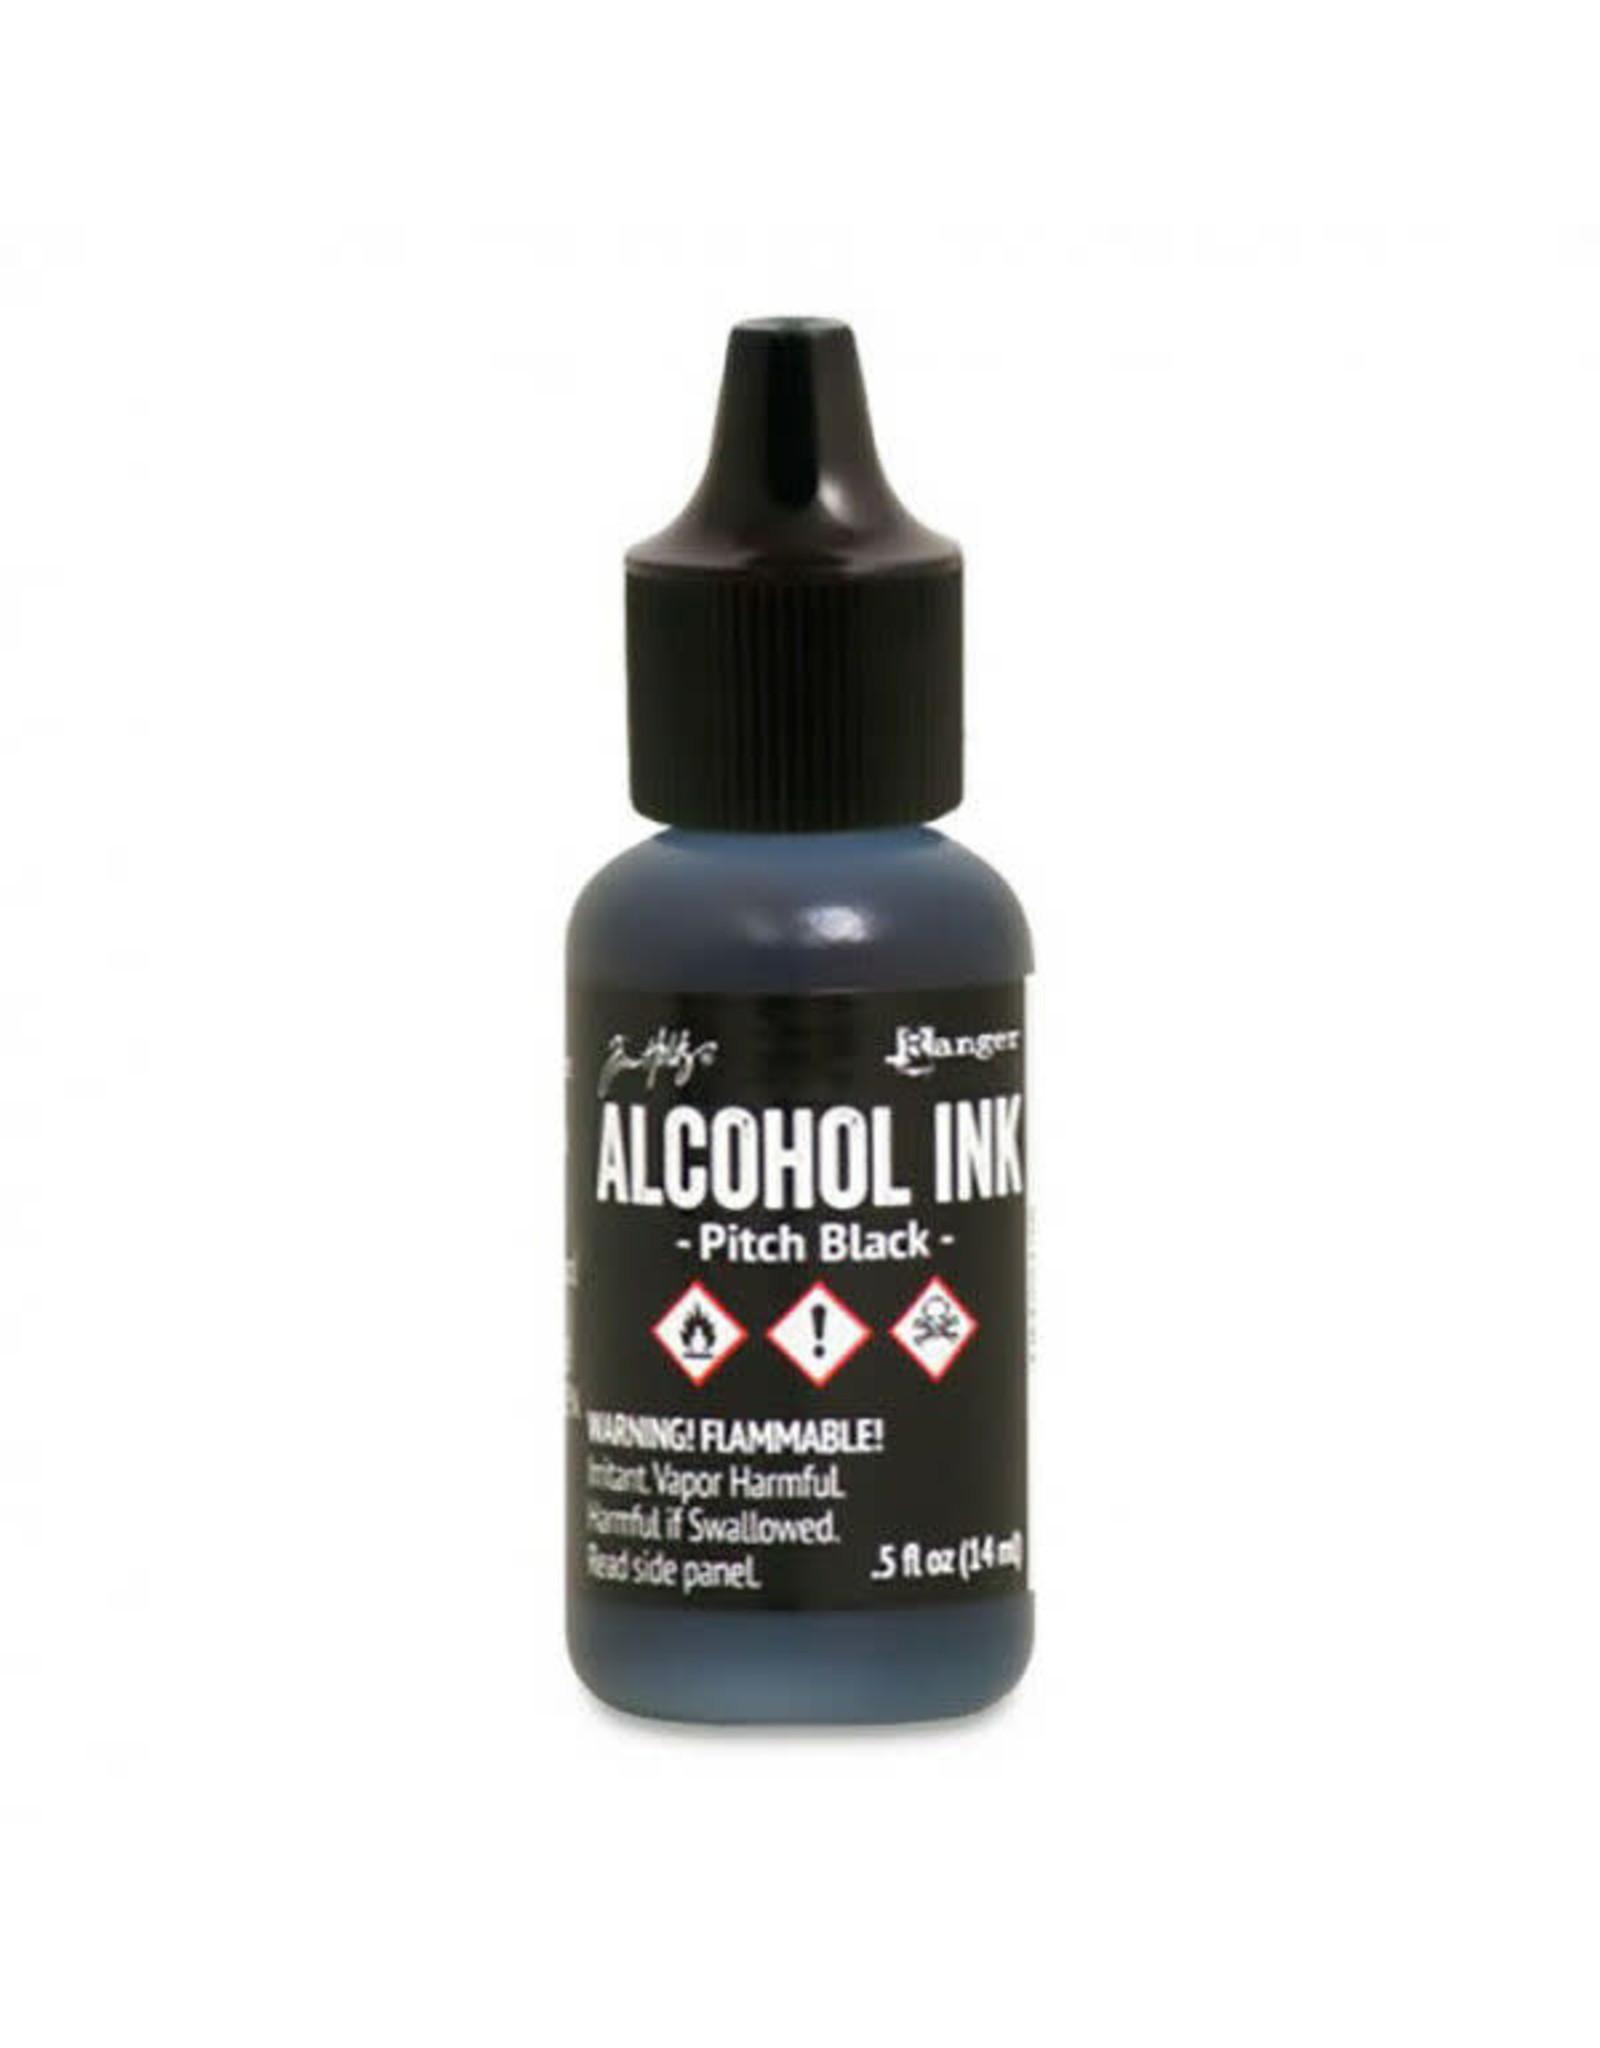 Tim Holtz Alcohol Ink 1/2 oz Pitch Black